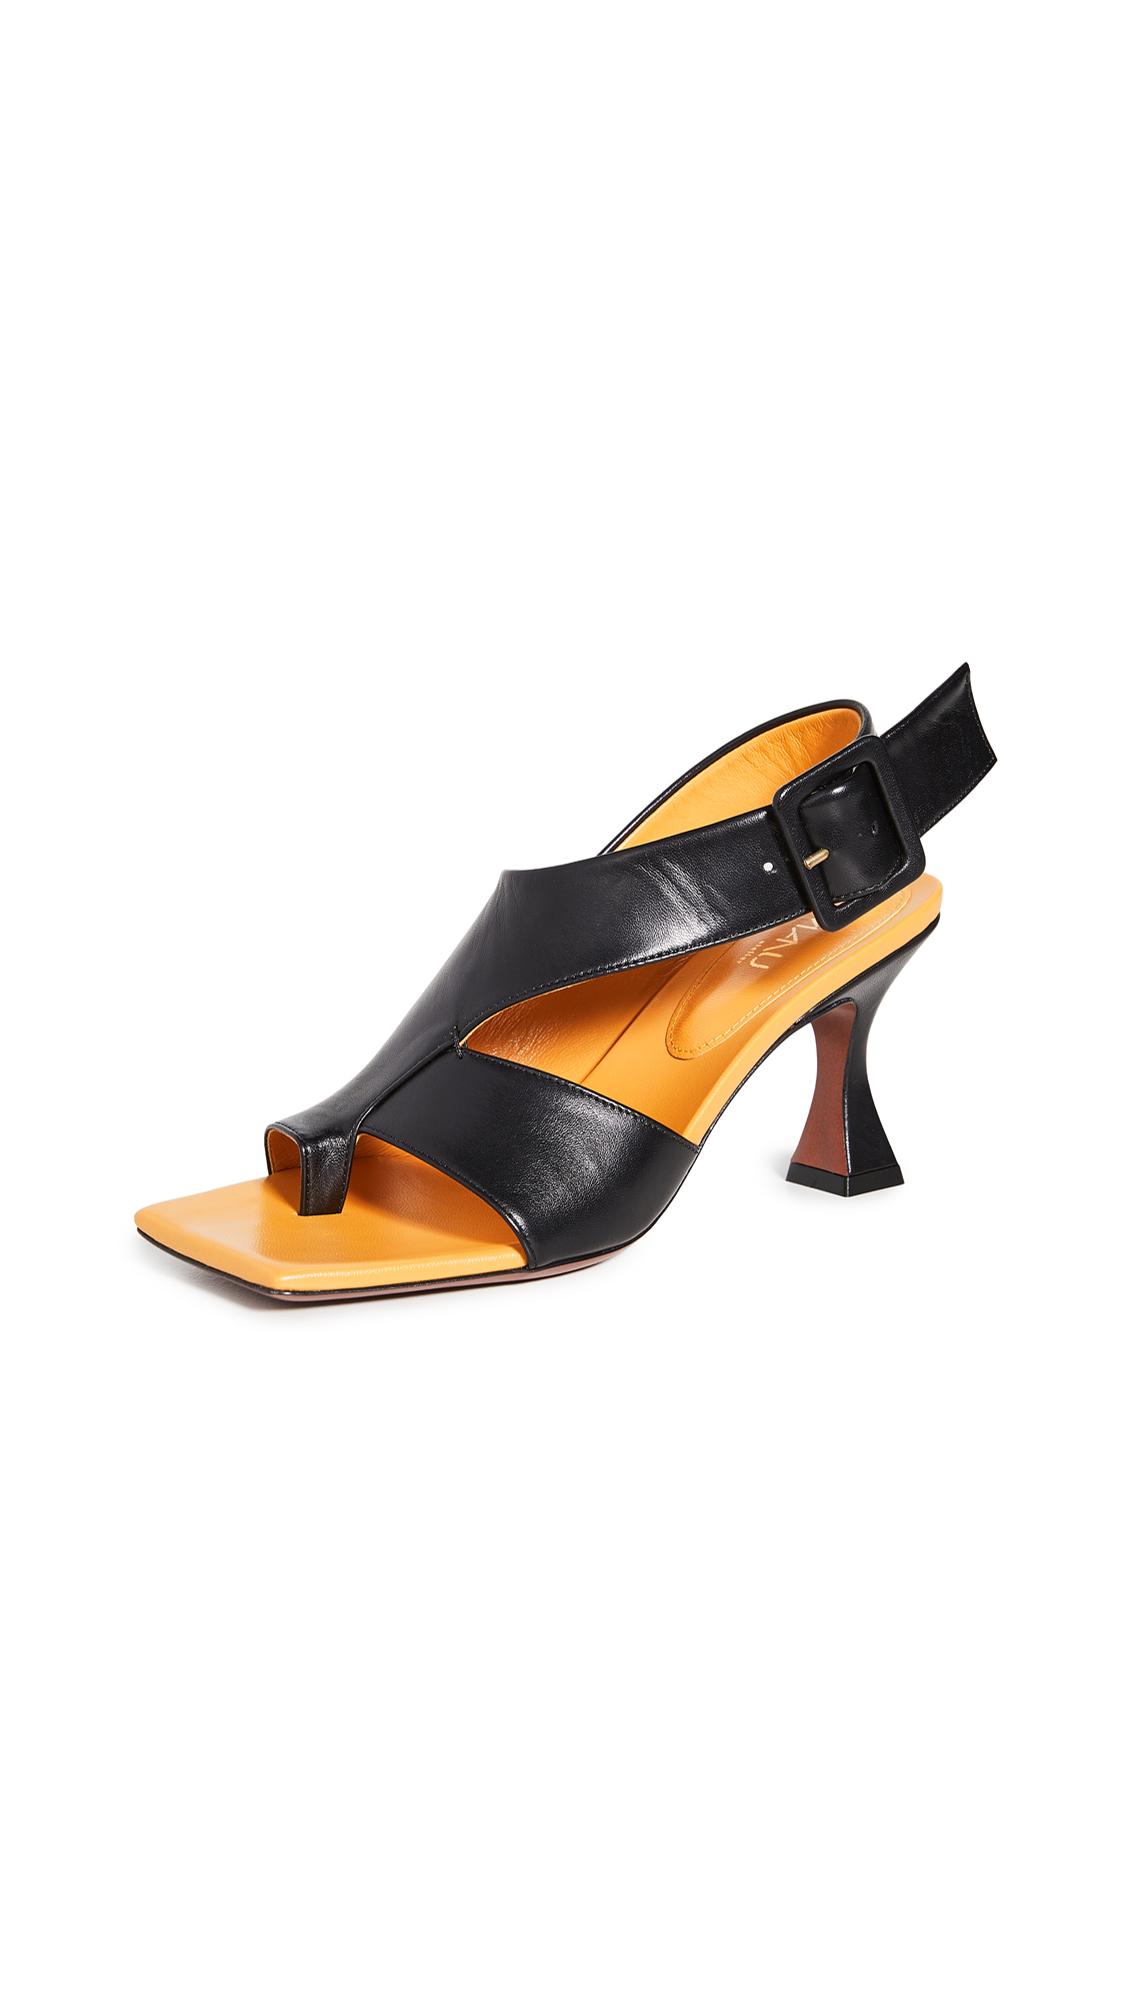 Buy MANU Atelier Rey XX Sandals online, shop MANU Atelier